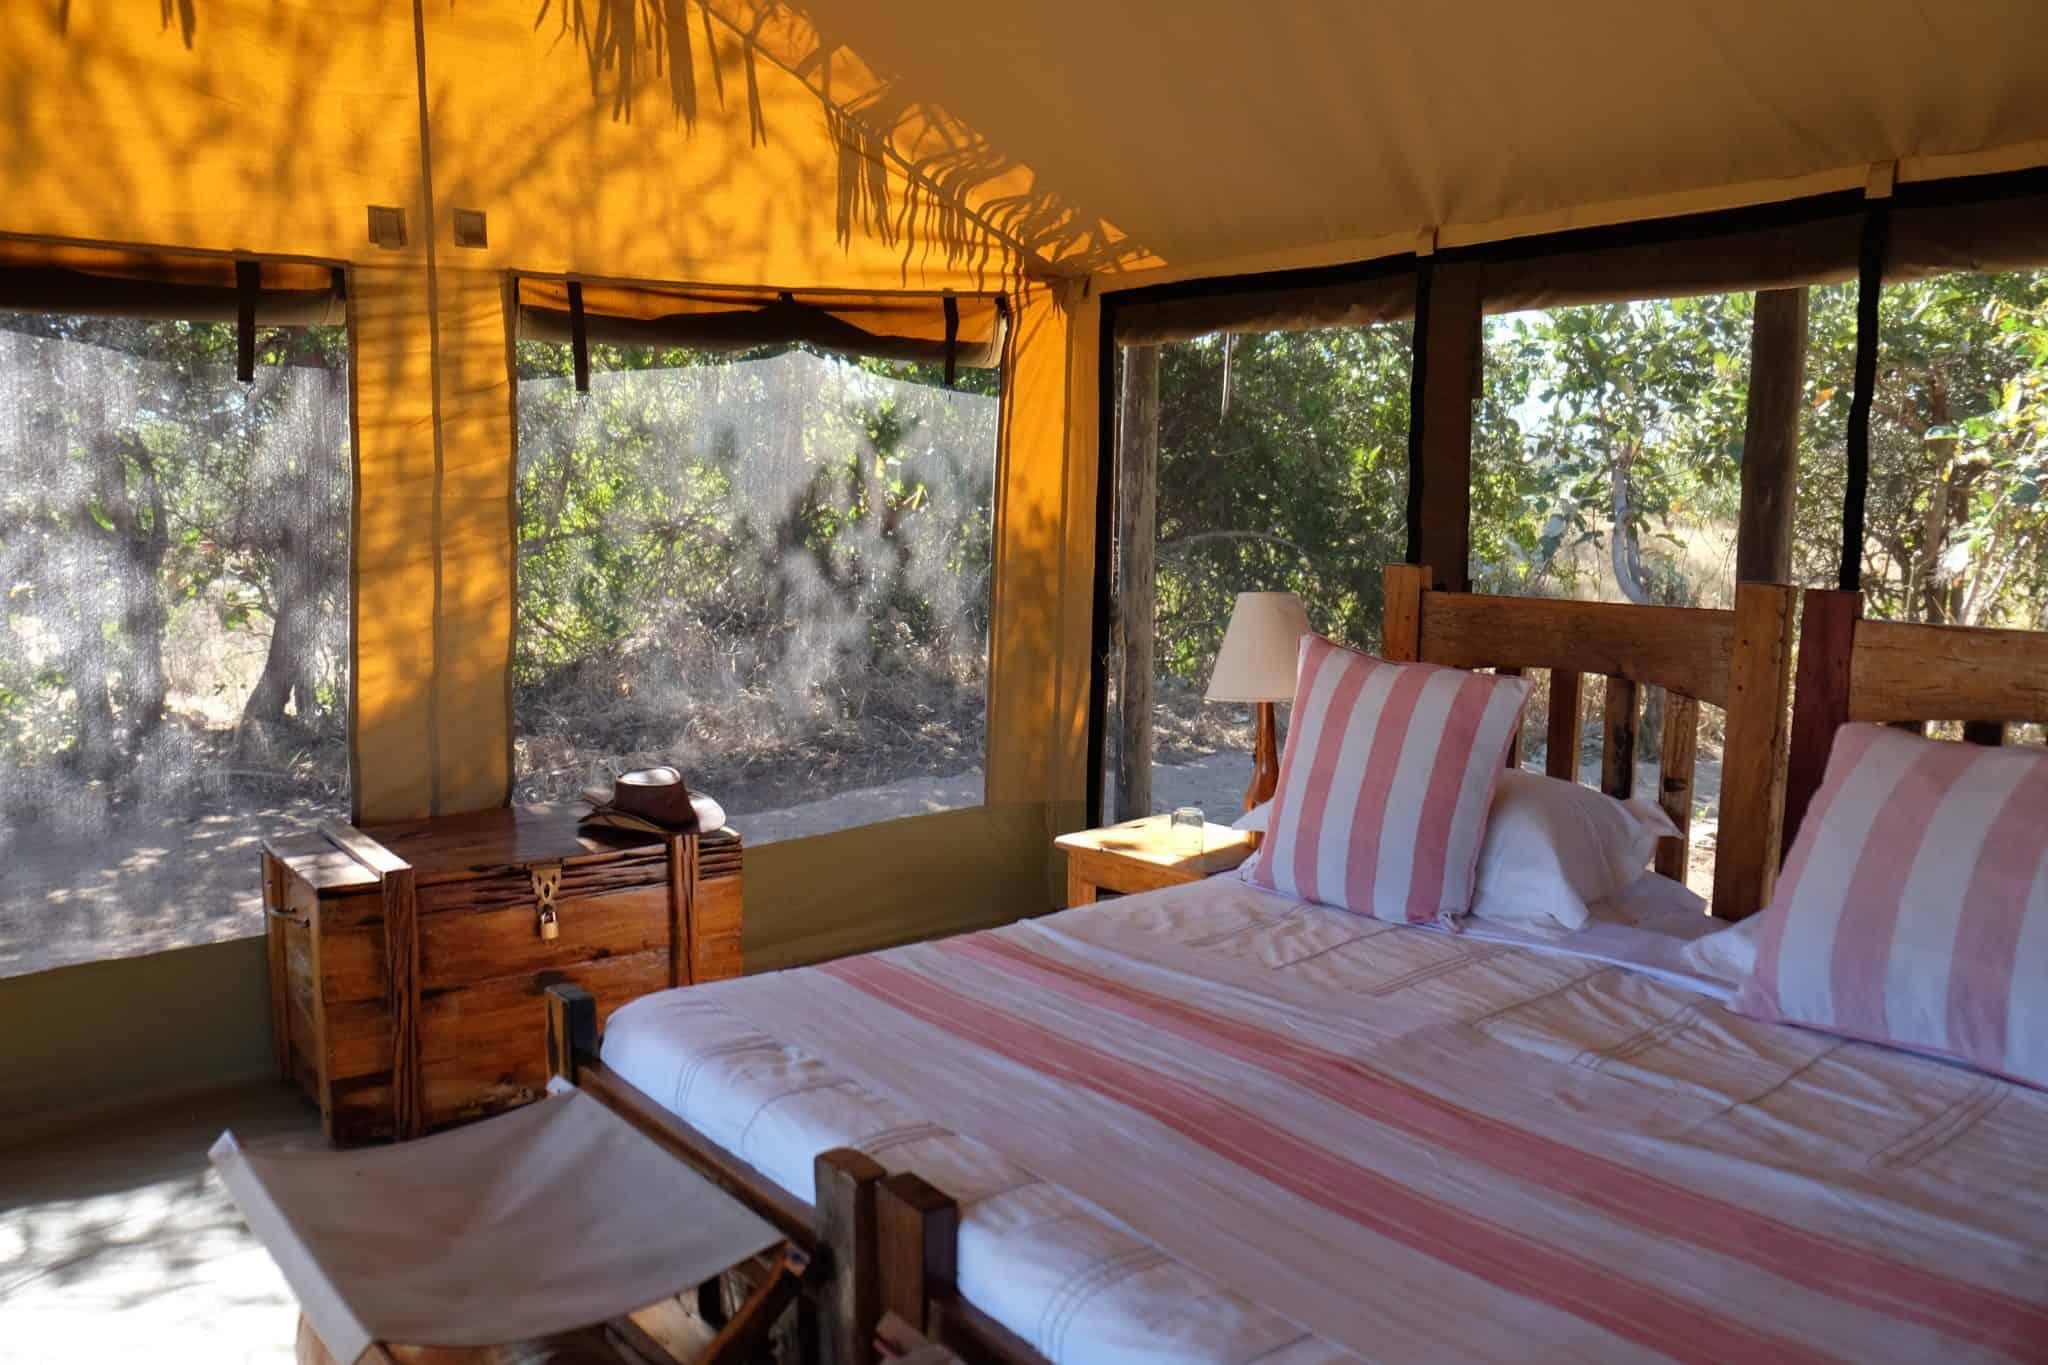 Rooms at Kigelia